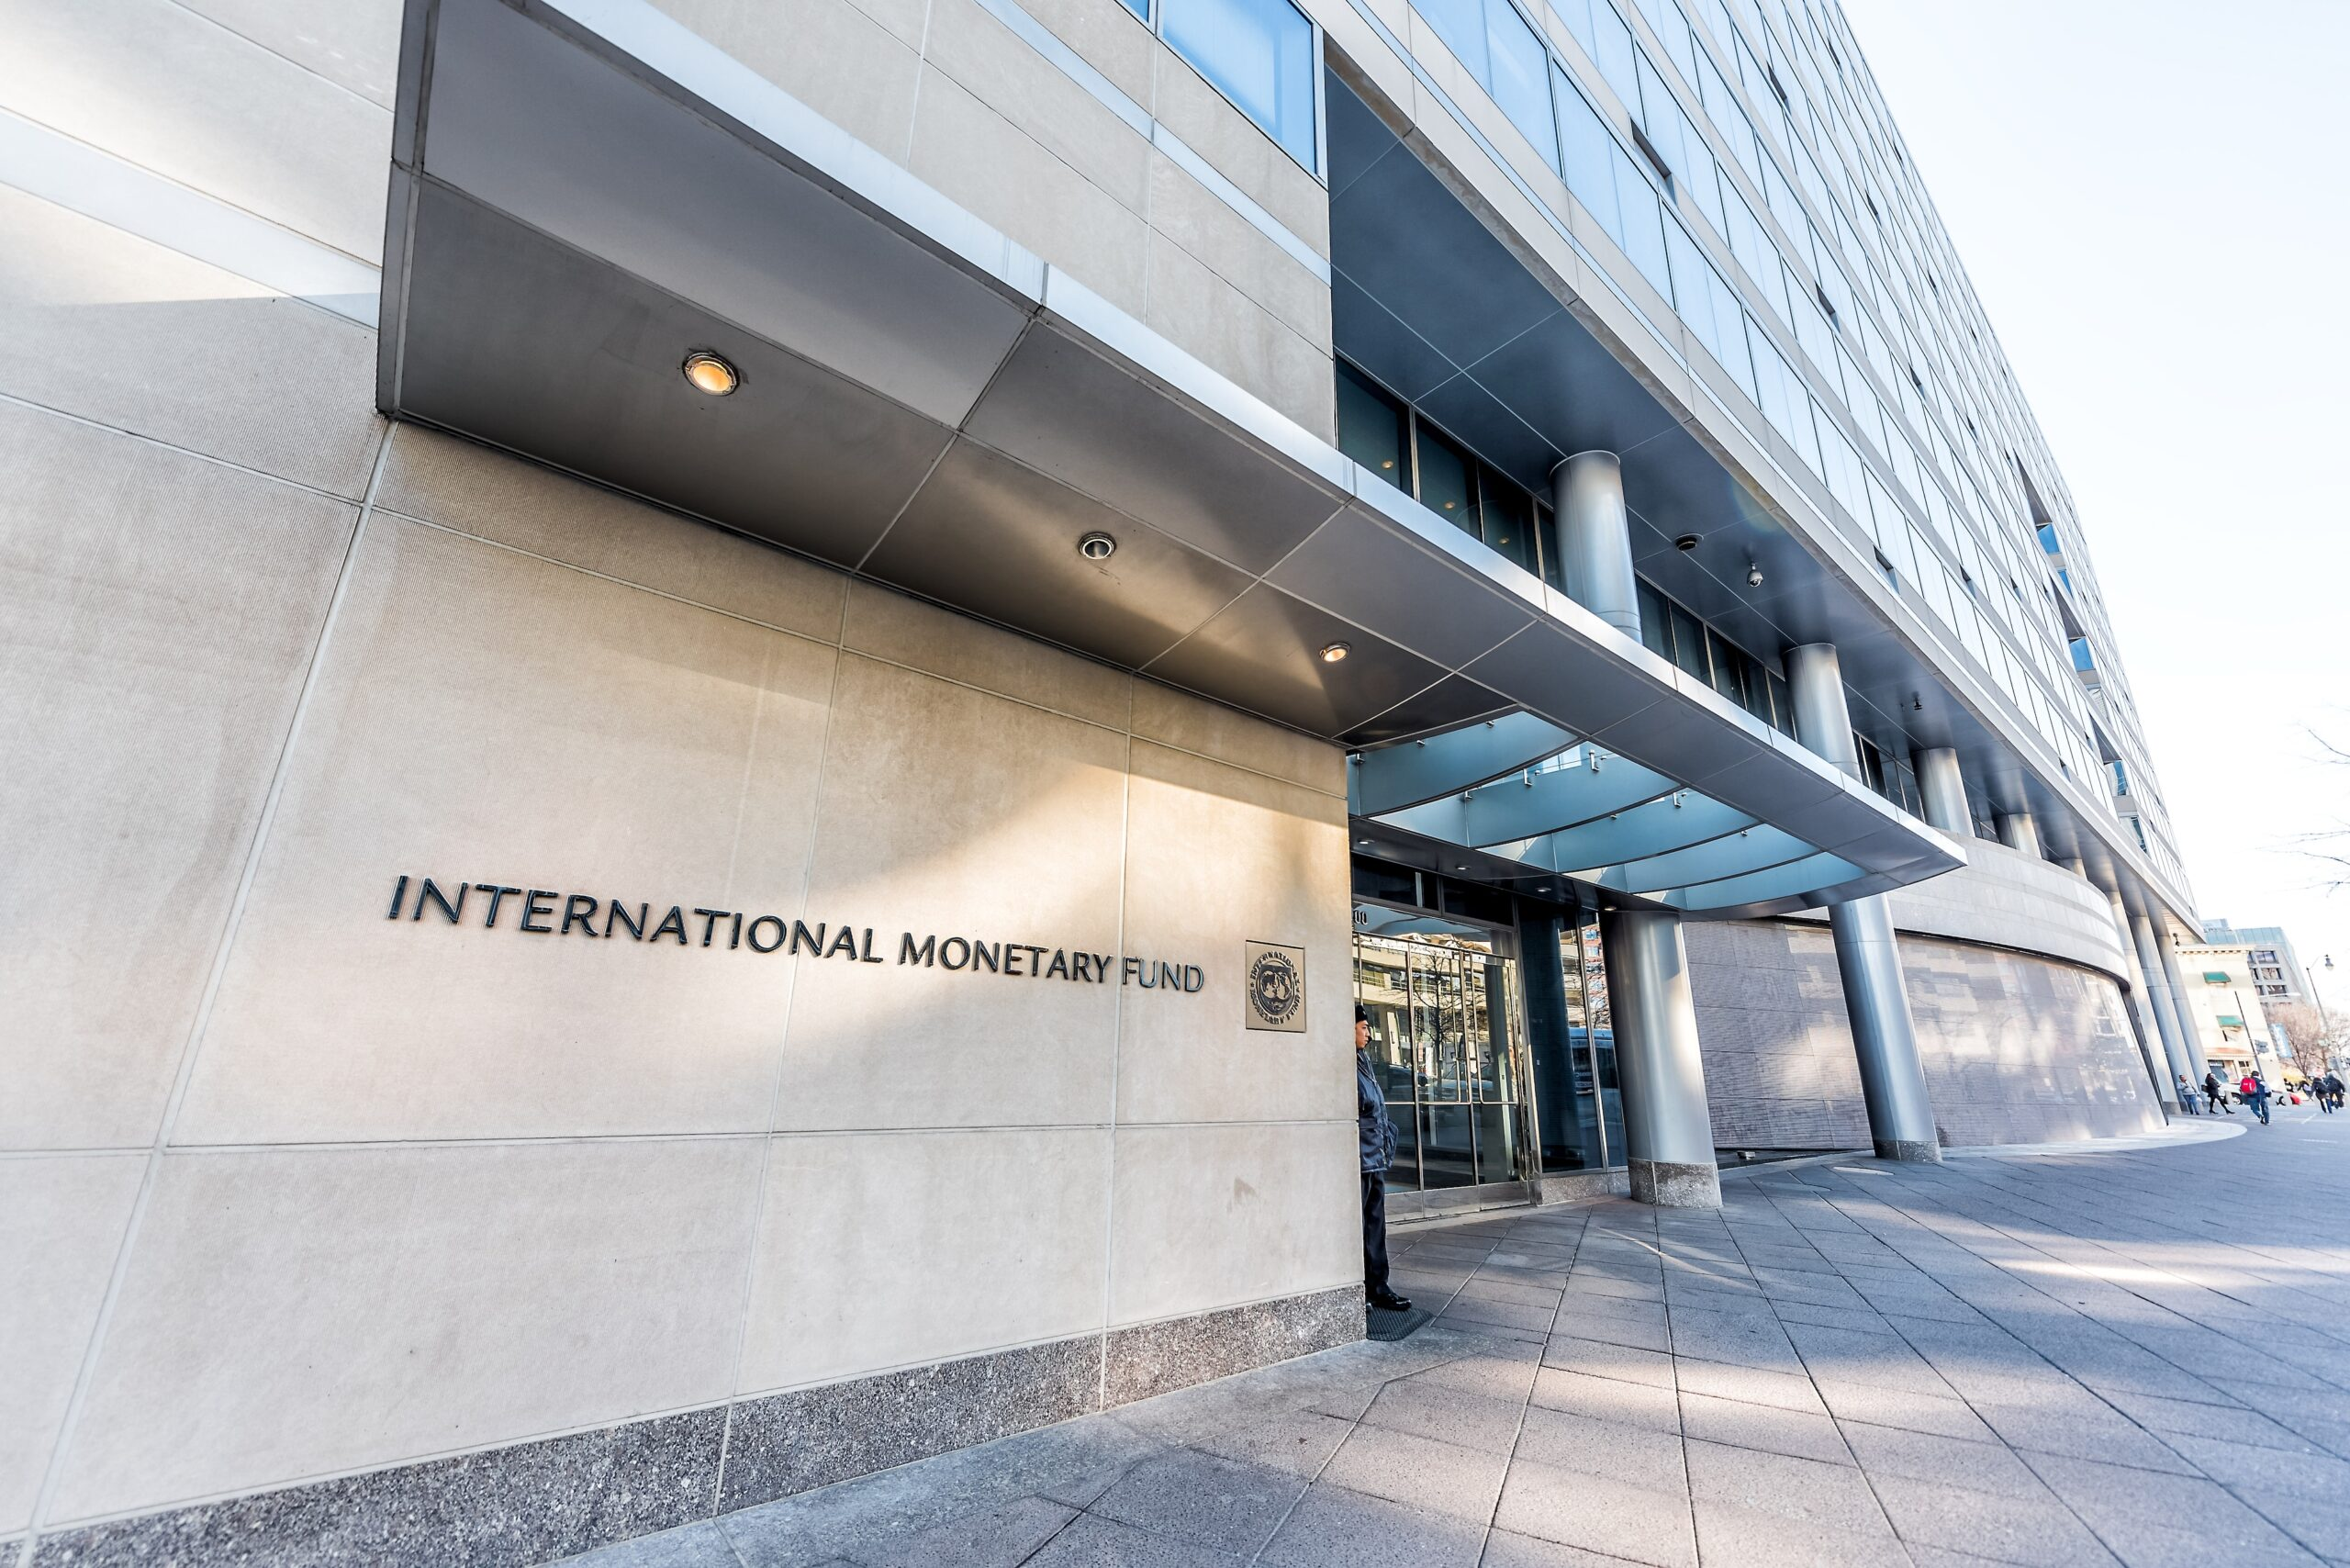 Entrada do International Monetary Fund (MF) em Washington